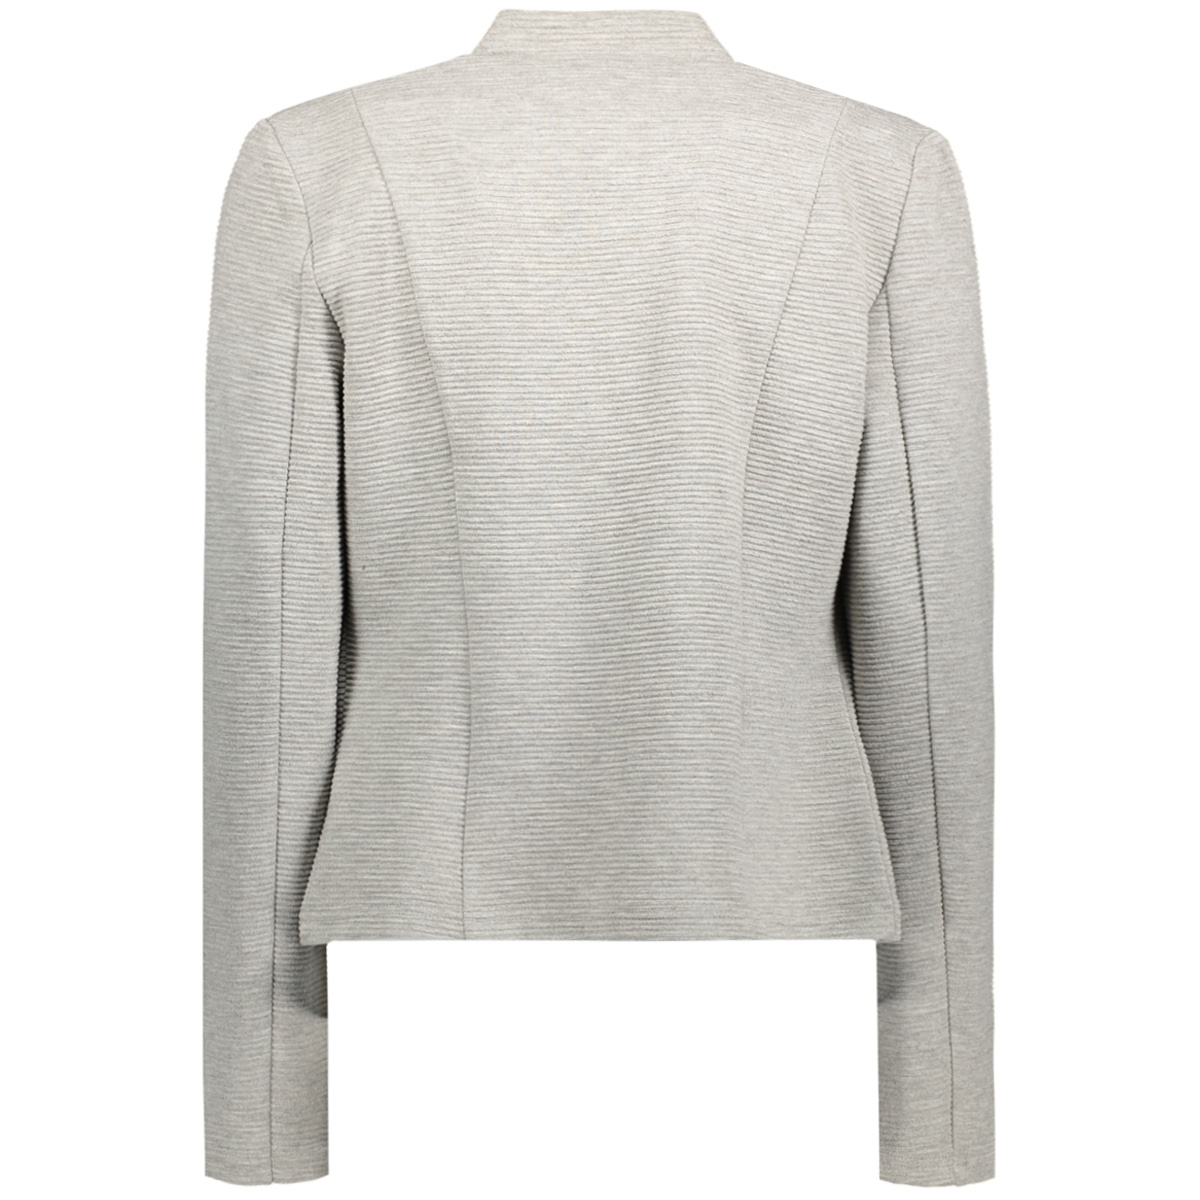 3923062.09.71 tom tailor blazer 2973